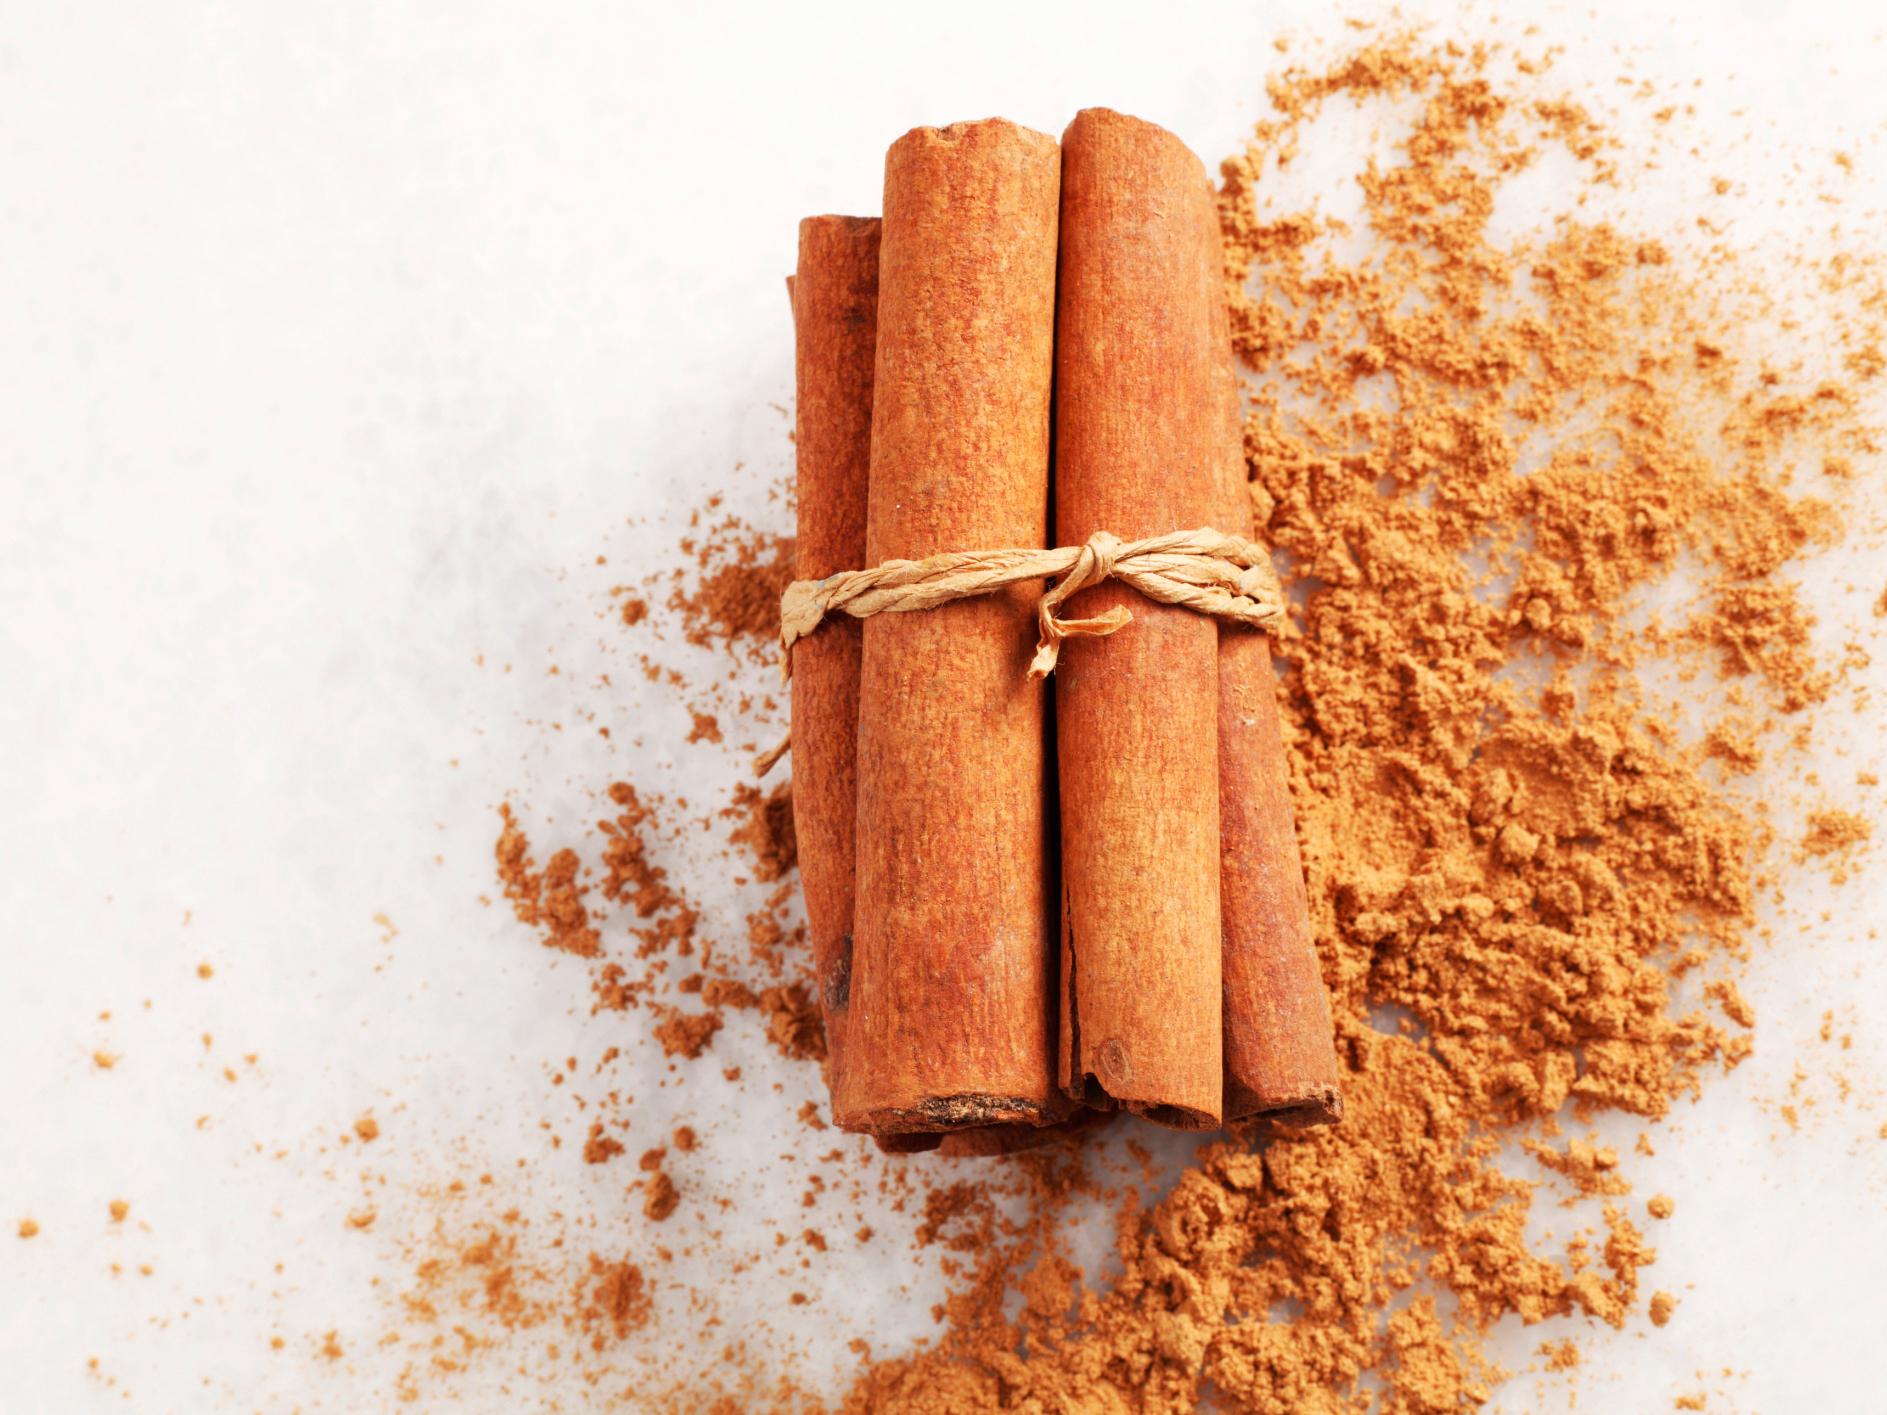 Cinnamon has a multitude of health benefits